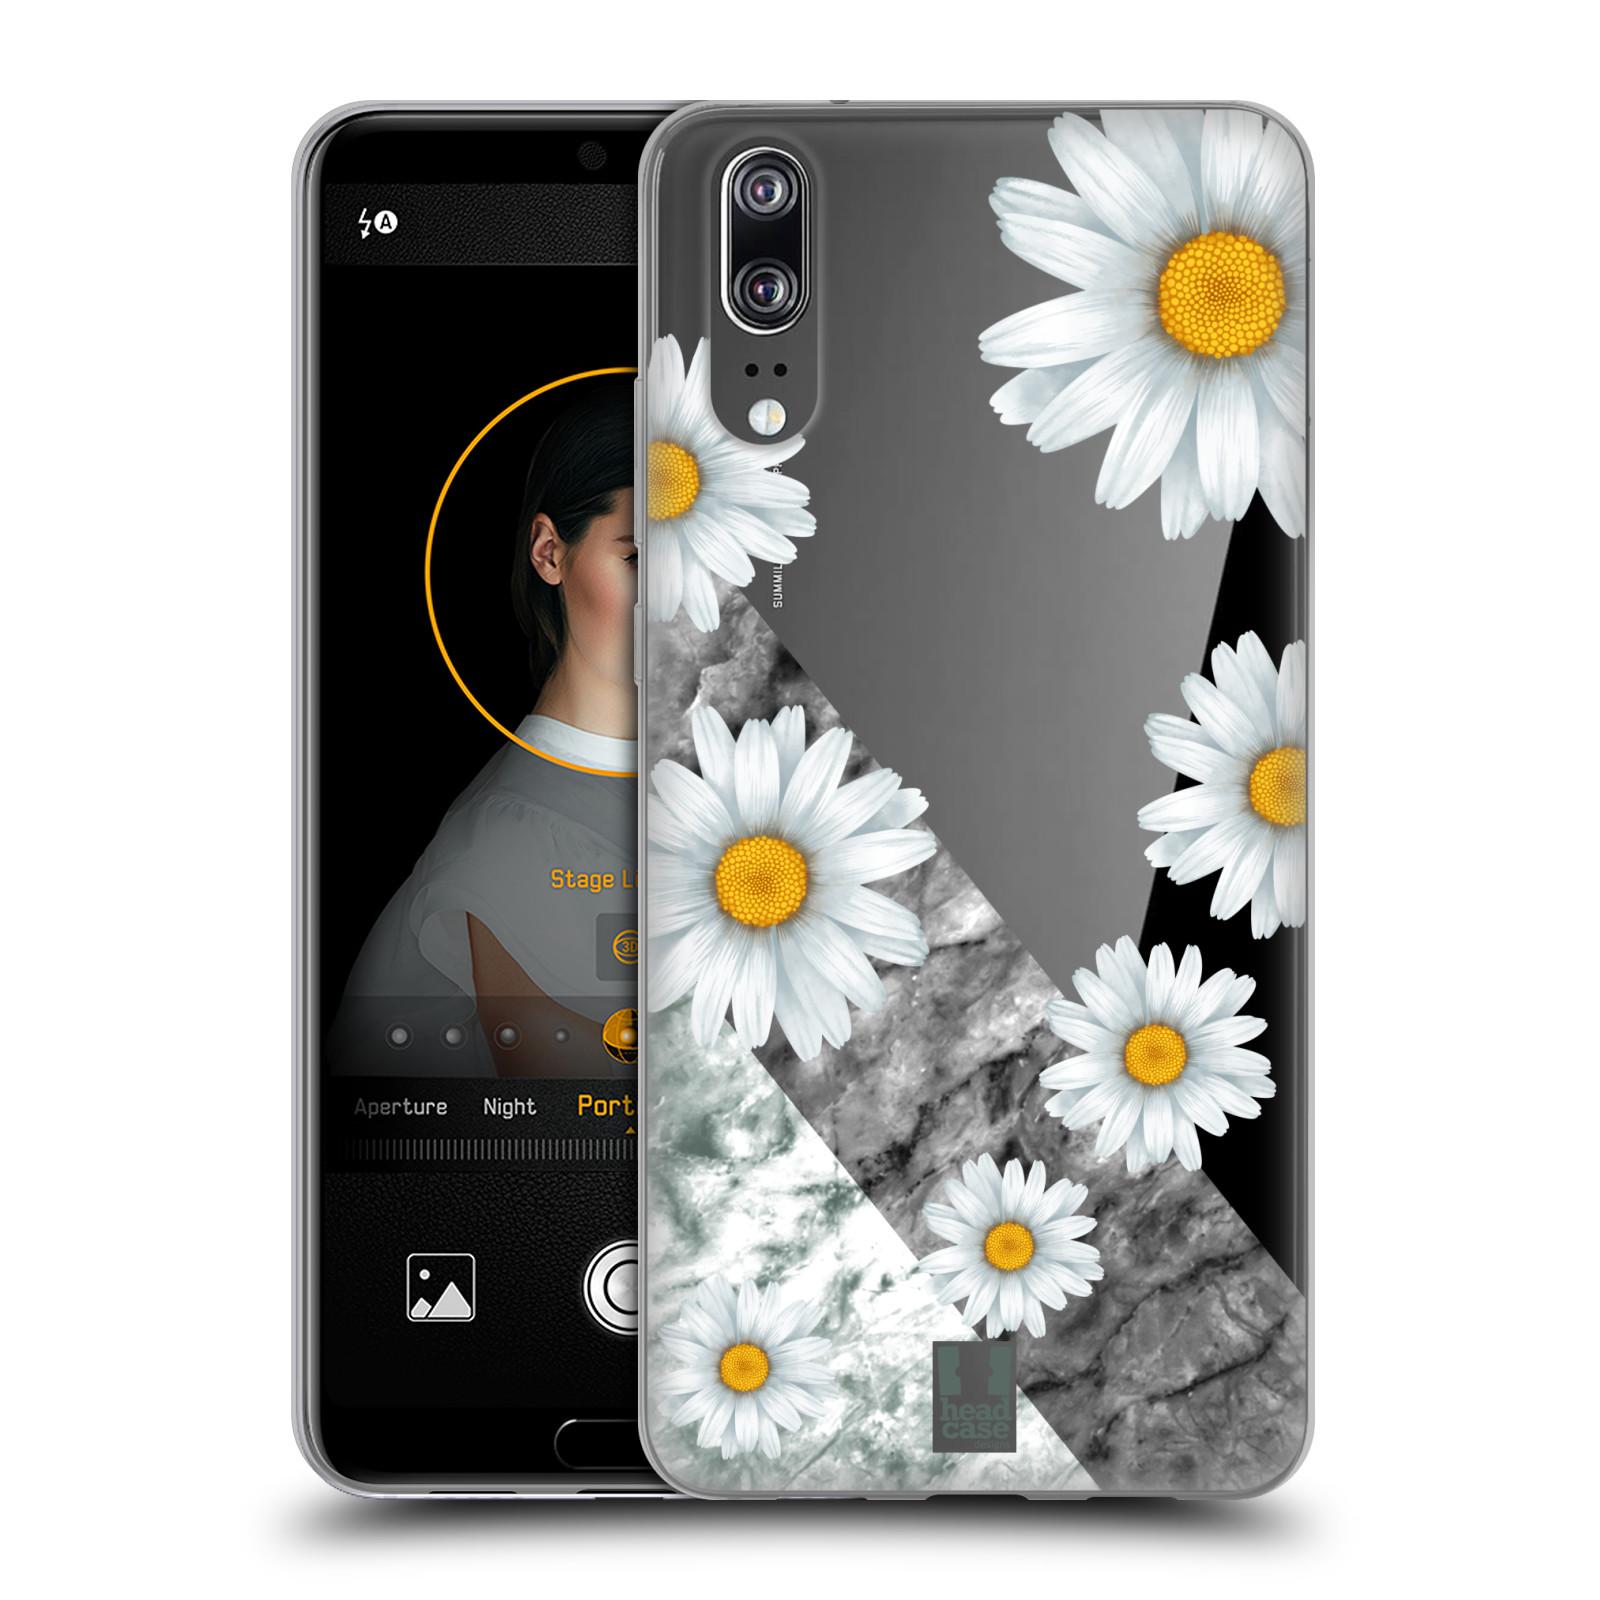 Silikonové pouzdro na mobil Huawei P20 - Head Case - Kopretiny a mramor